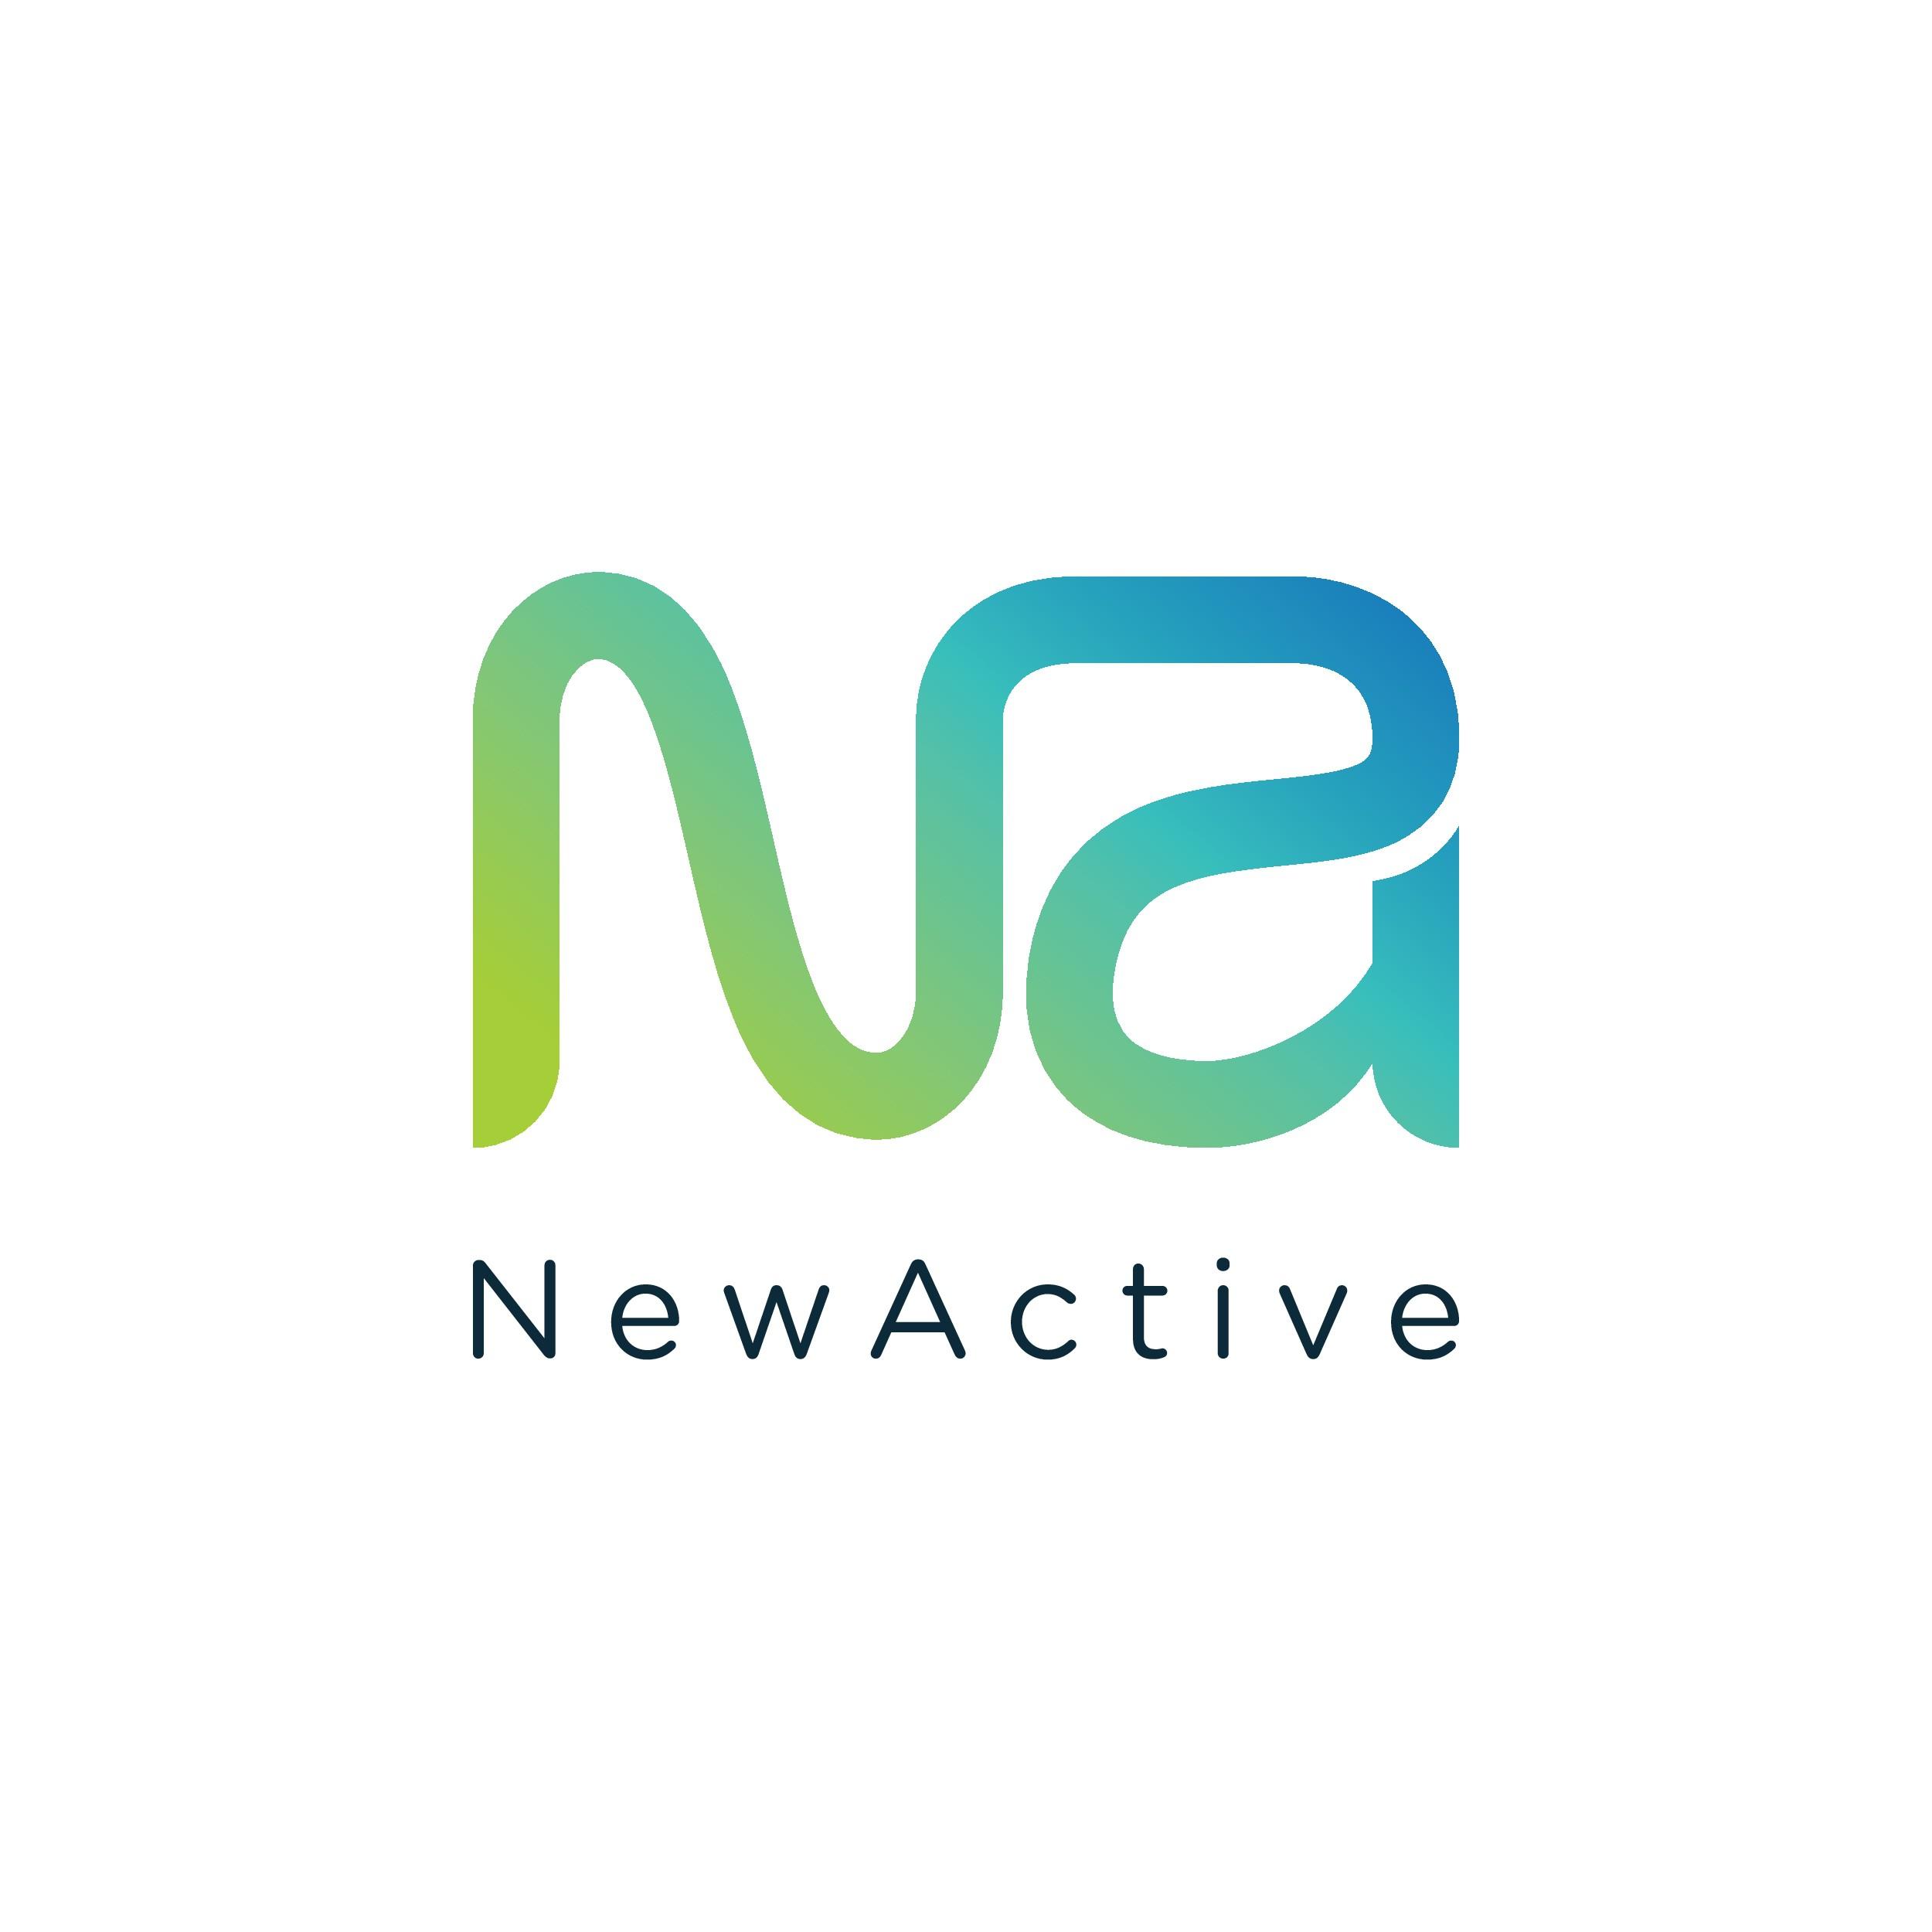 GUARANTEED WINNER! Inspired trademark LOGO DESIGN needed for a premium supplement brand: NewActive